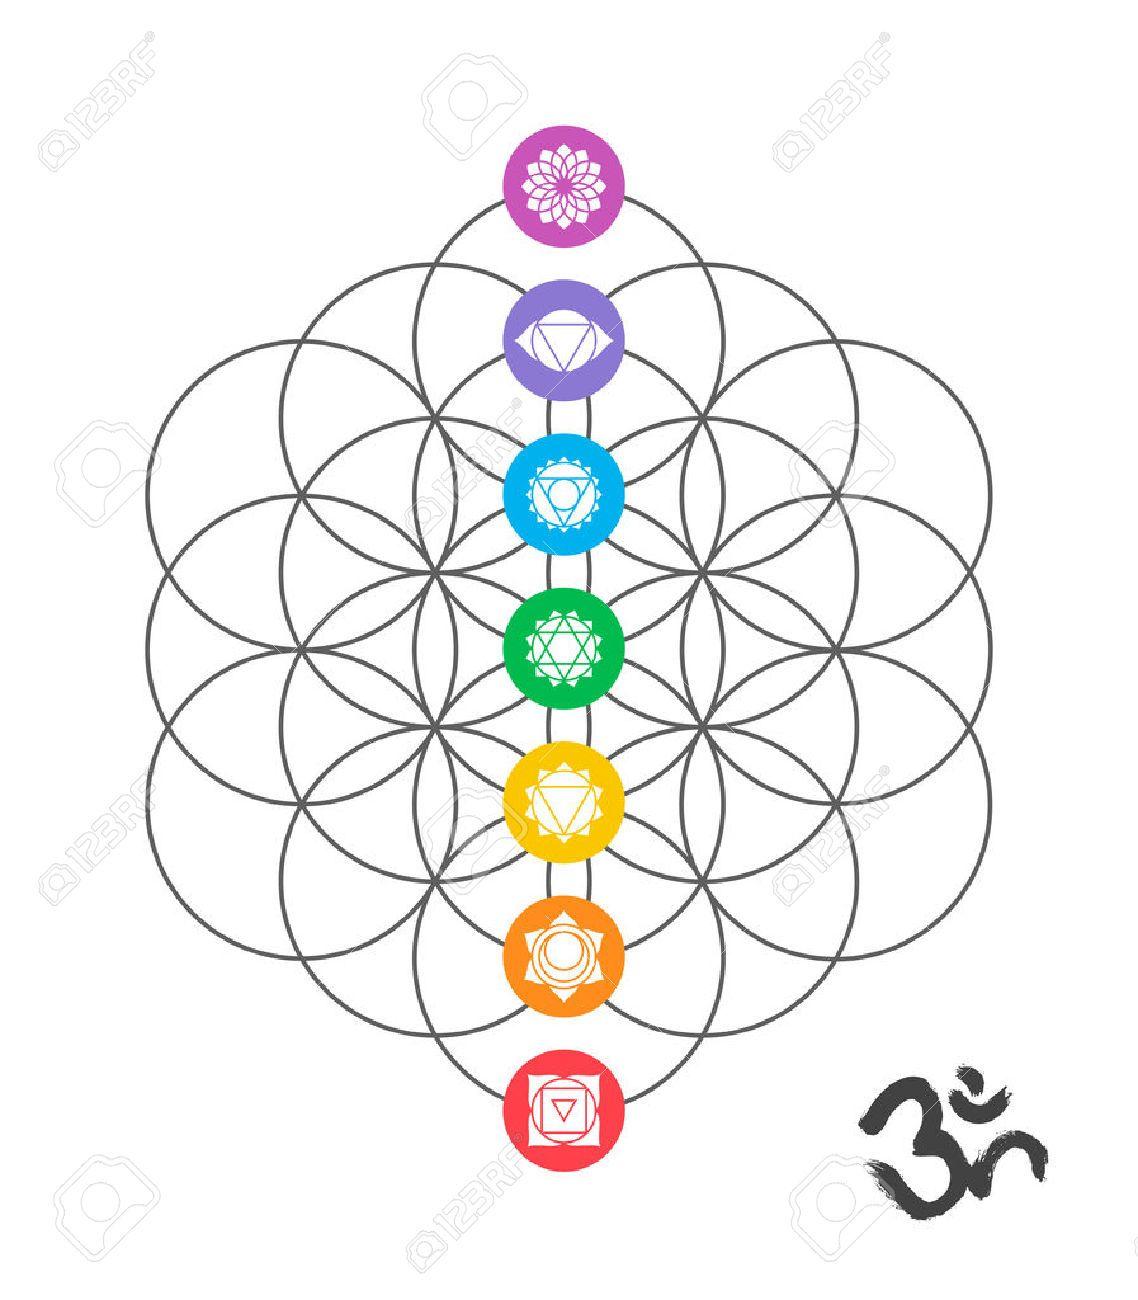 6,498 Chakra Symbols Stock Vector Illustration And Royalty.